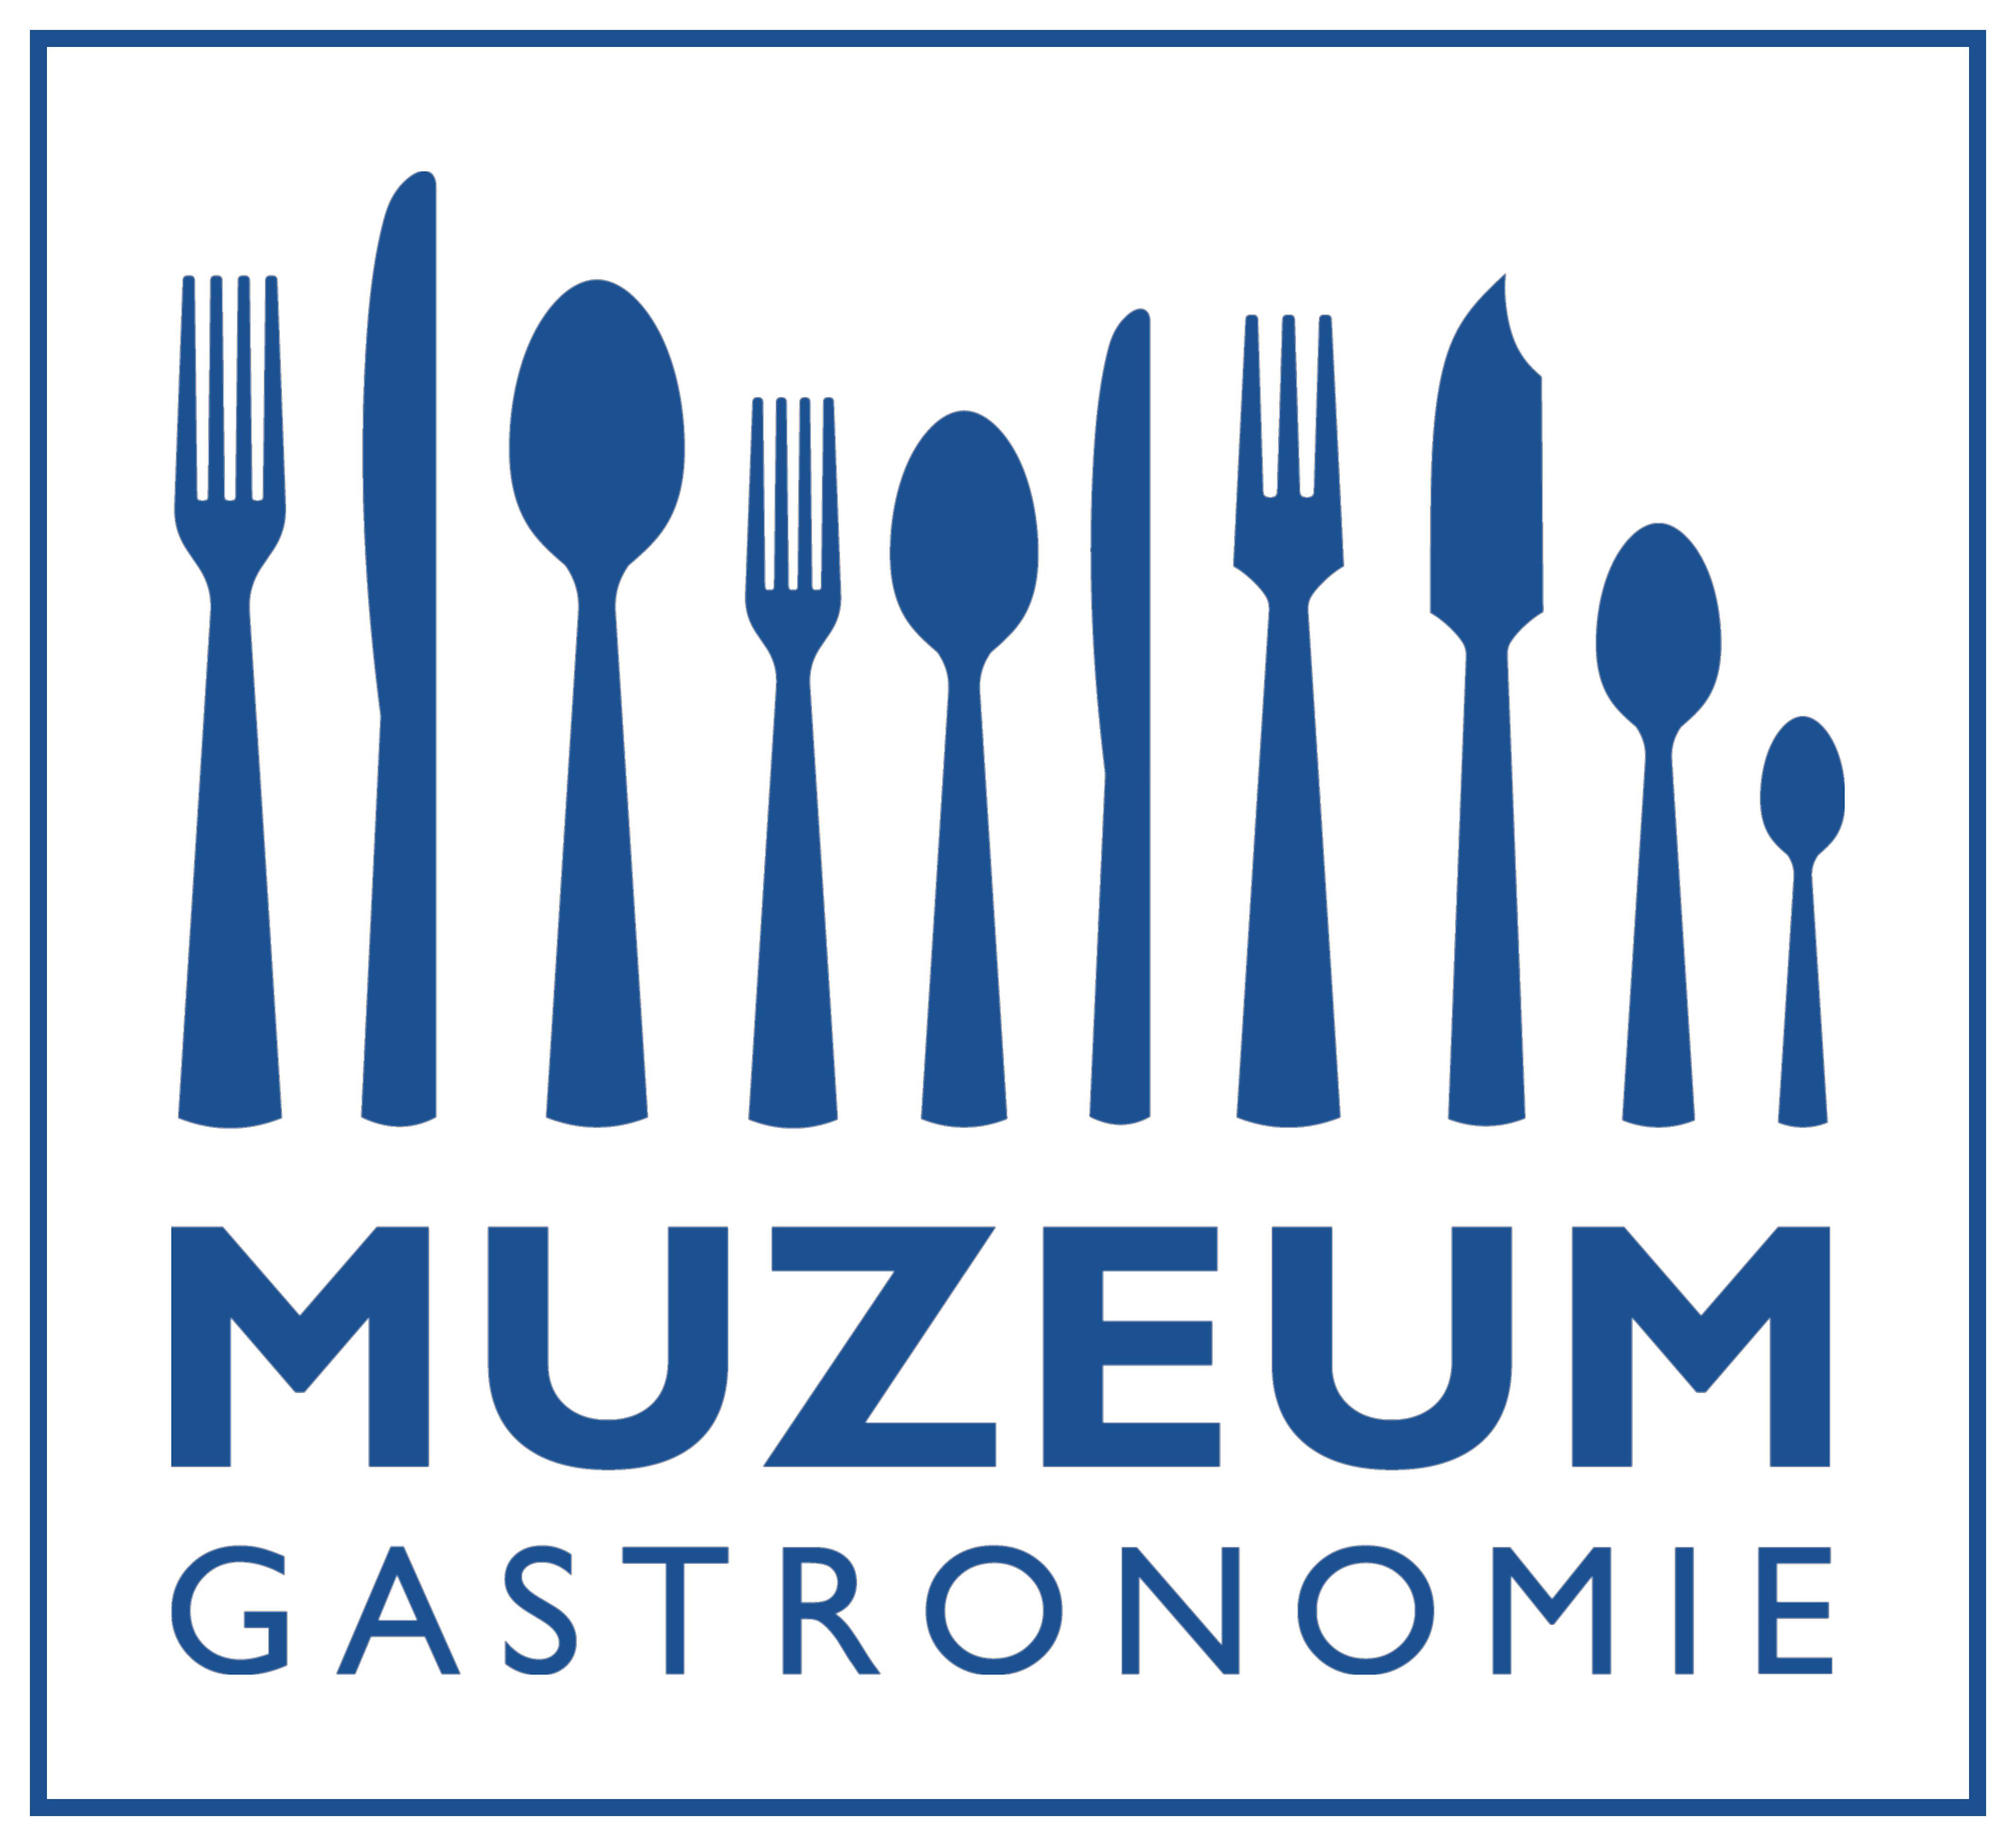 muzeum gastronomie